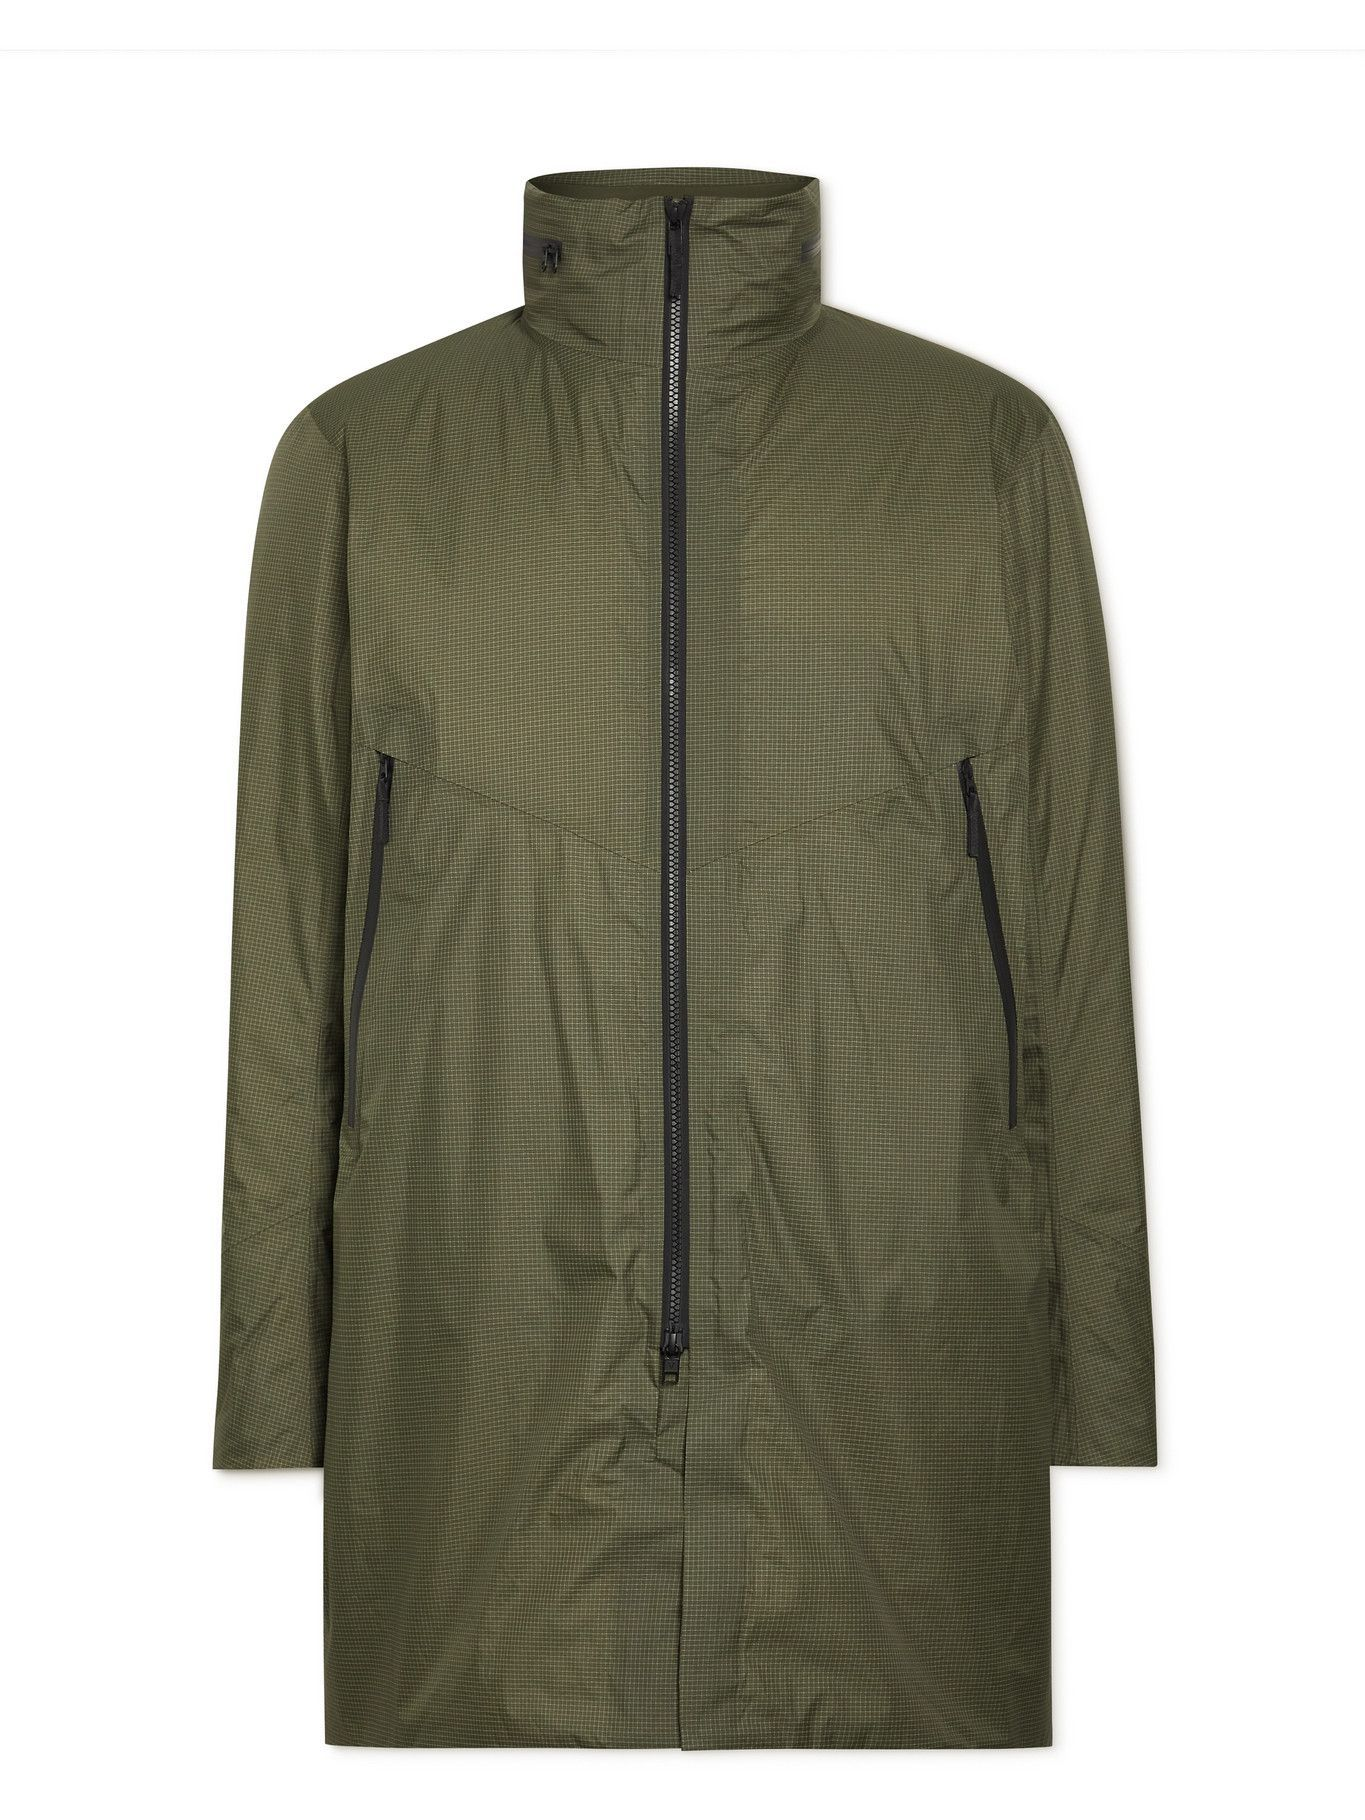 Photo: Veilance - Monitor GORE-TEX Ripstop Hooded Jacket - Green